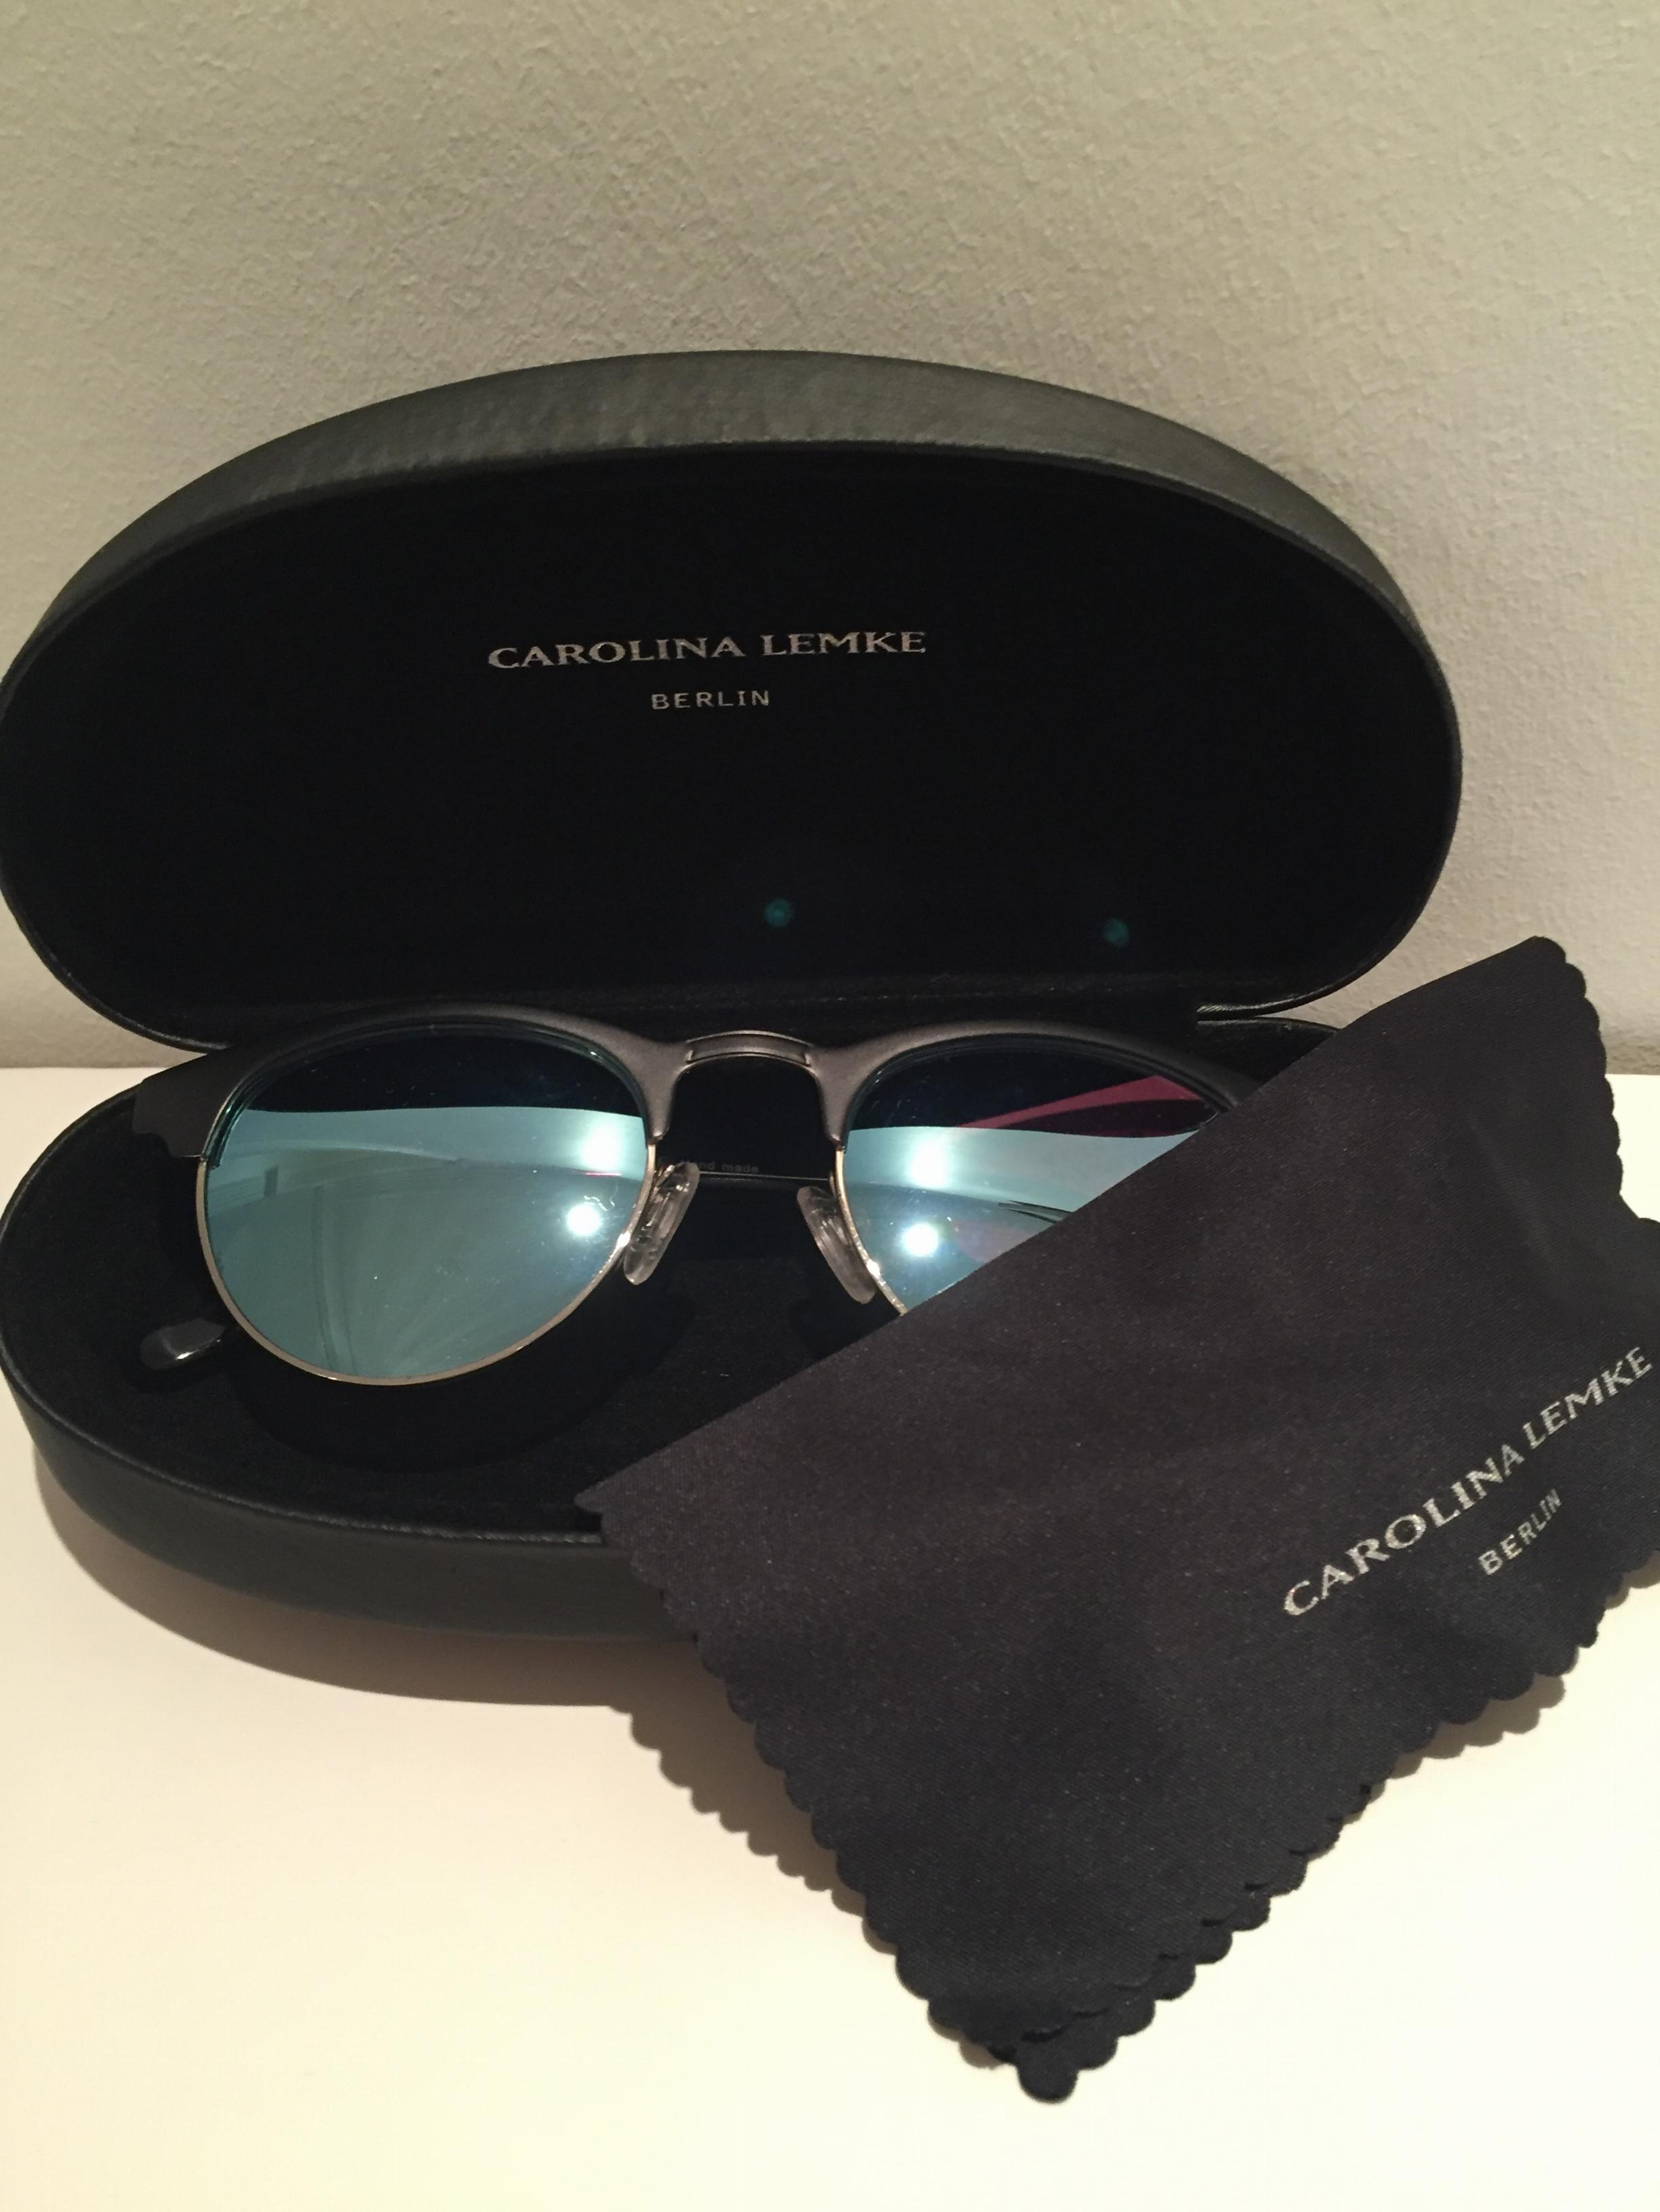 2a72d84cb1fca Carolina Lemke Berlin Sunglasses. 25. 12345678910